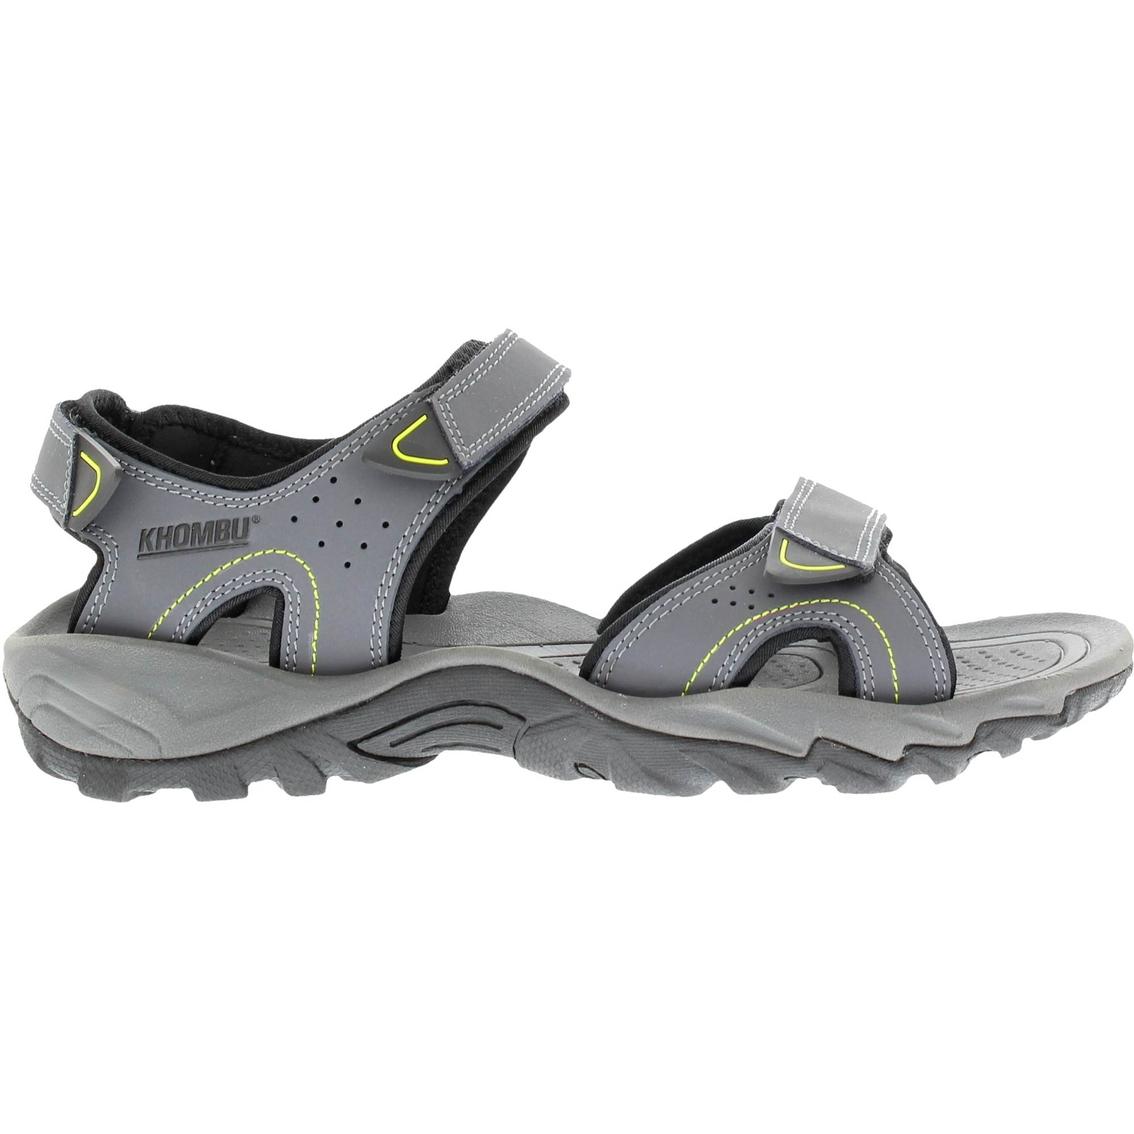 2b672eeba3 Khombu Whitewater Sandal | Sandals & Flip Flops | Apparel | Shop The ...